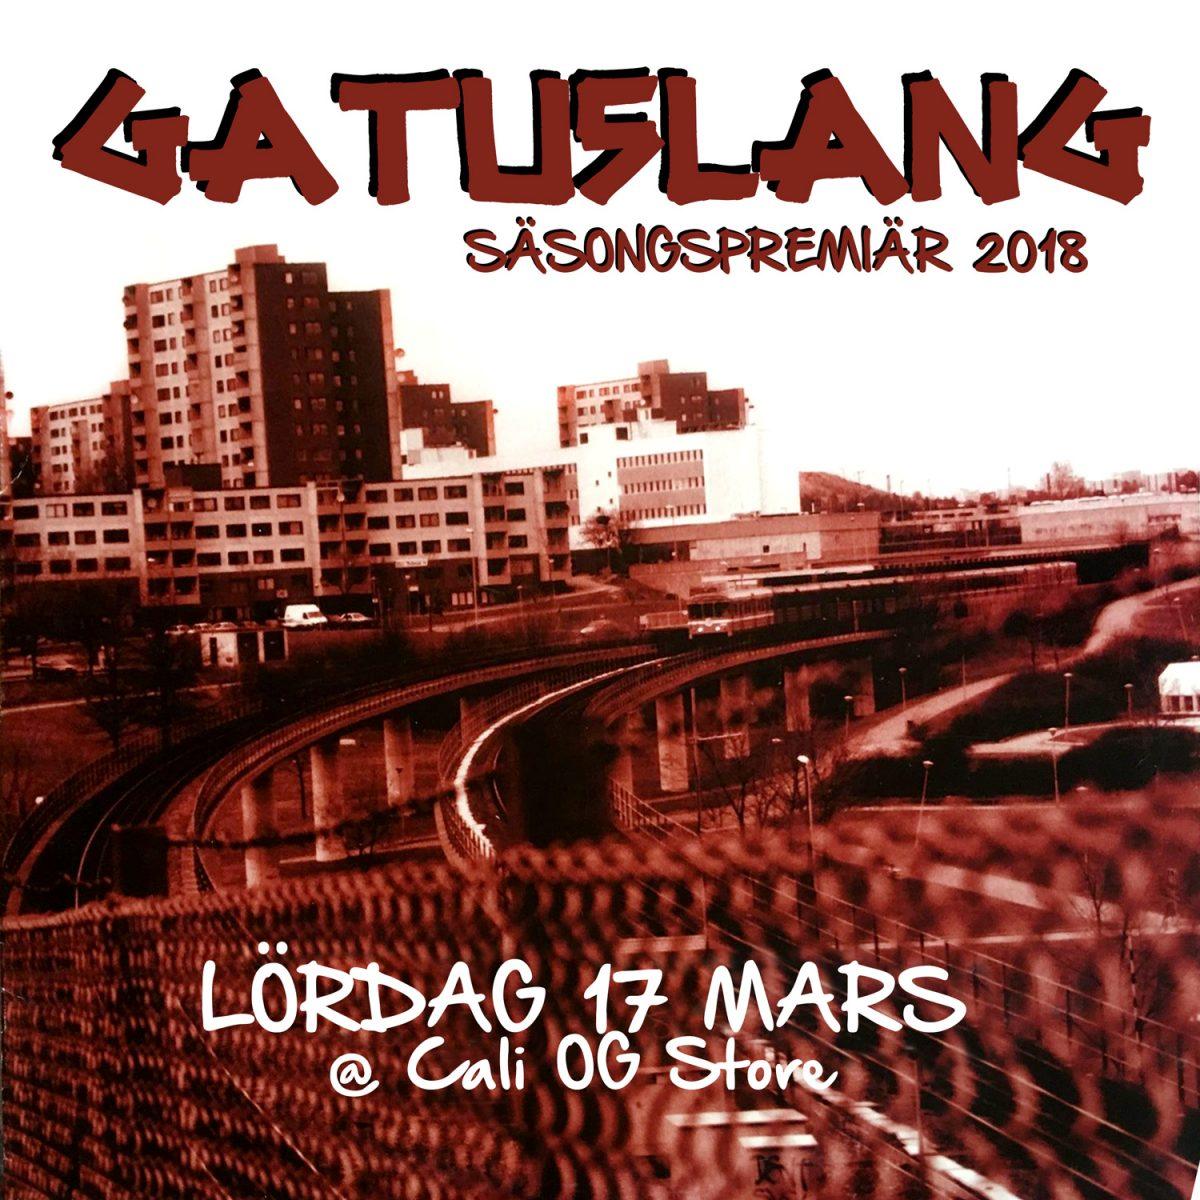 Gatuslang säsongspremiär och fet fest på Cali OG Store 17:e mars!